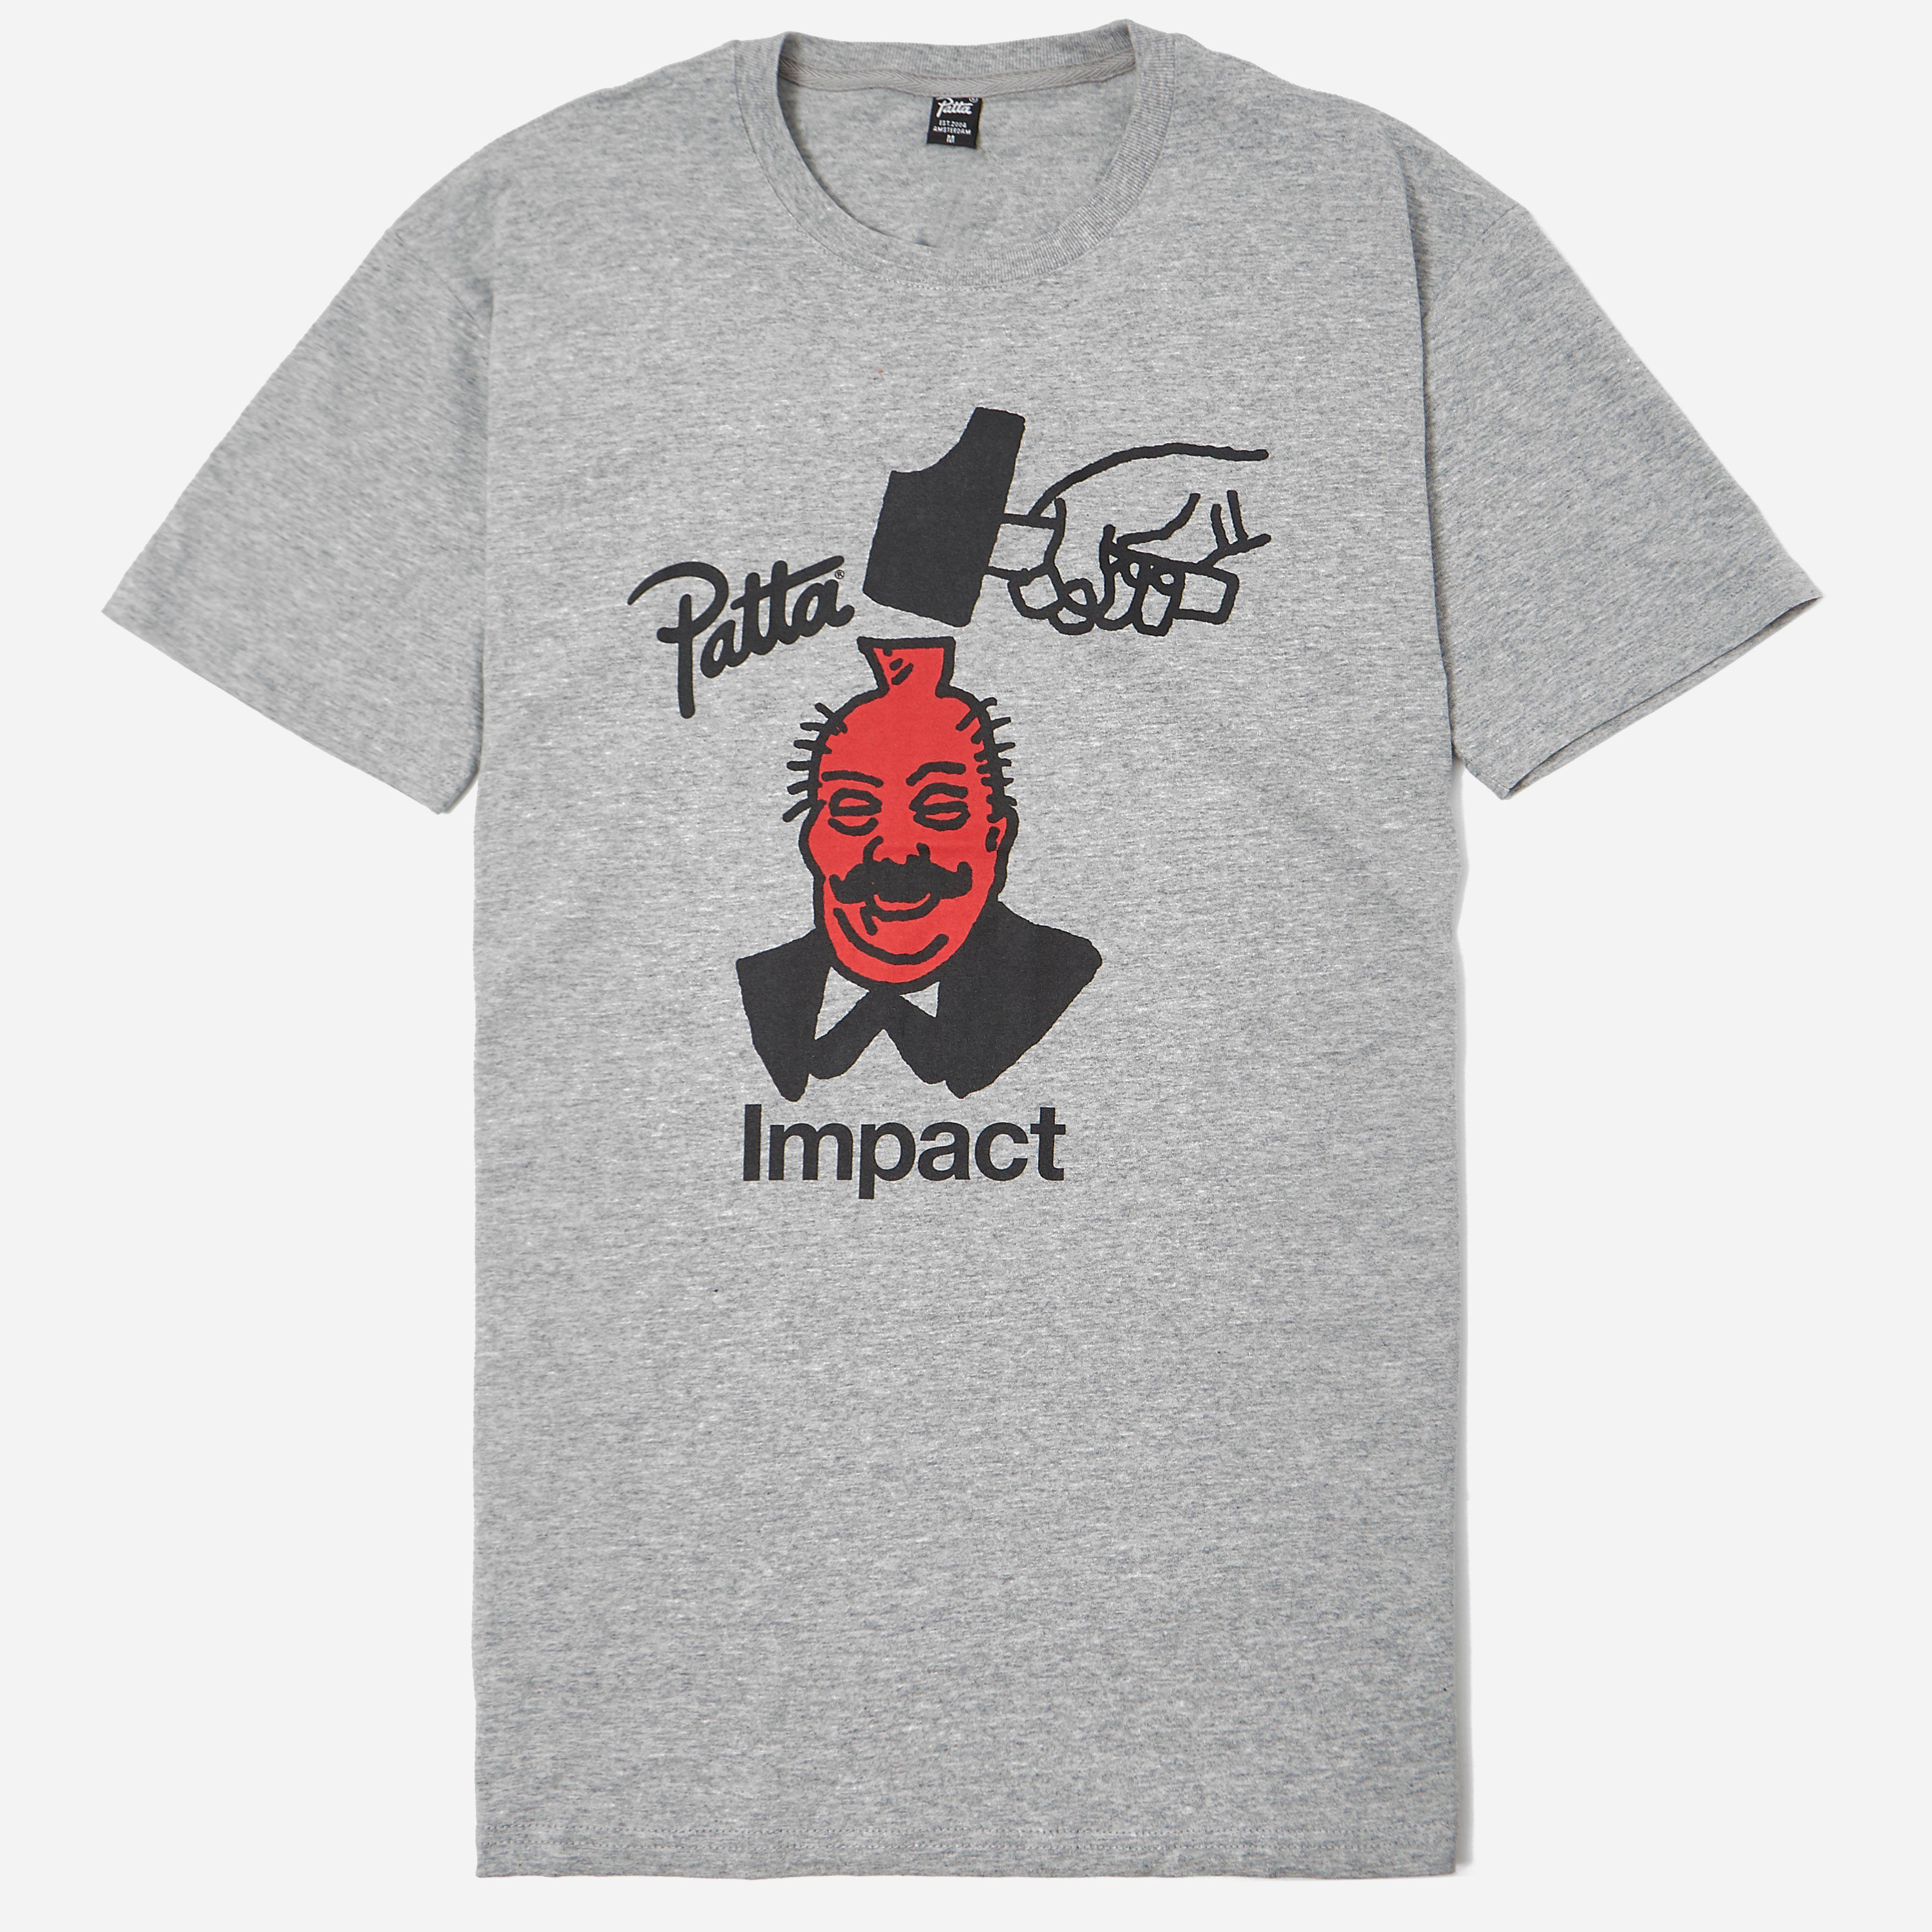 Patta Impact T-shirt